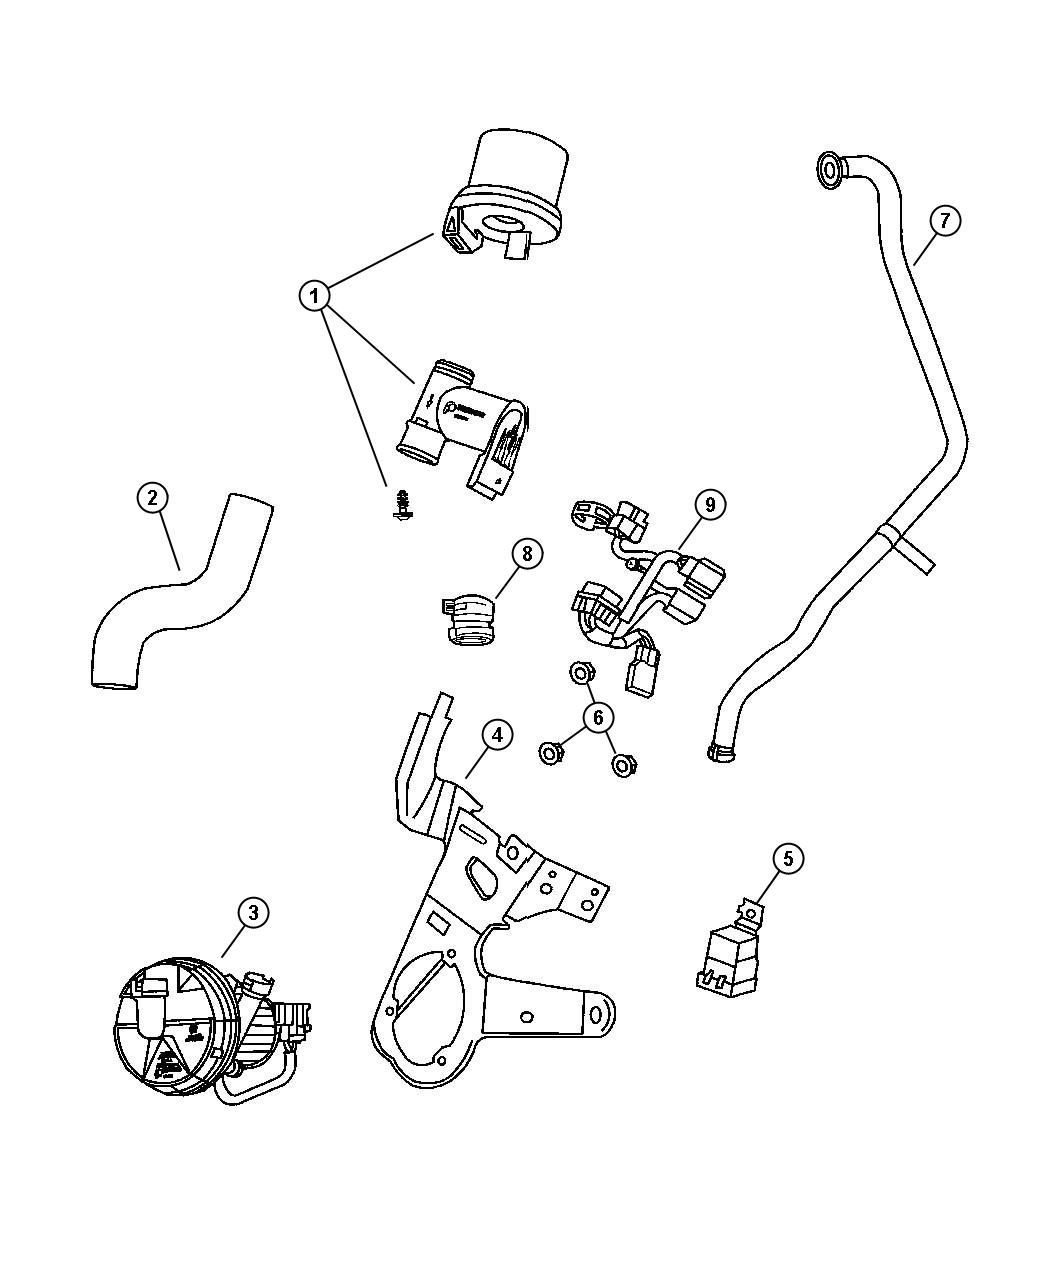 Chrysler Sebring Pump Air Injection Engine System